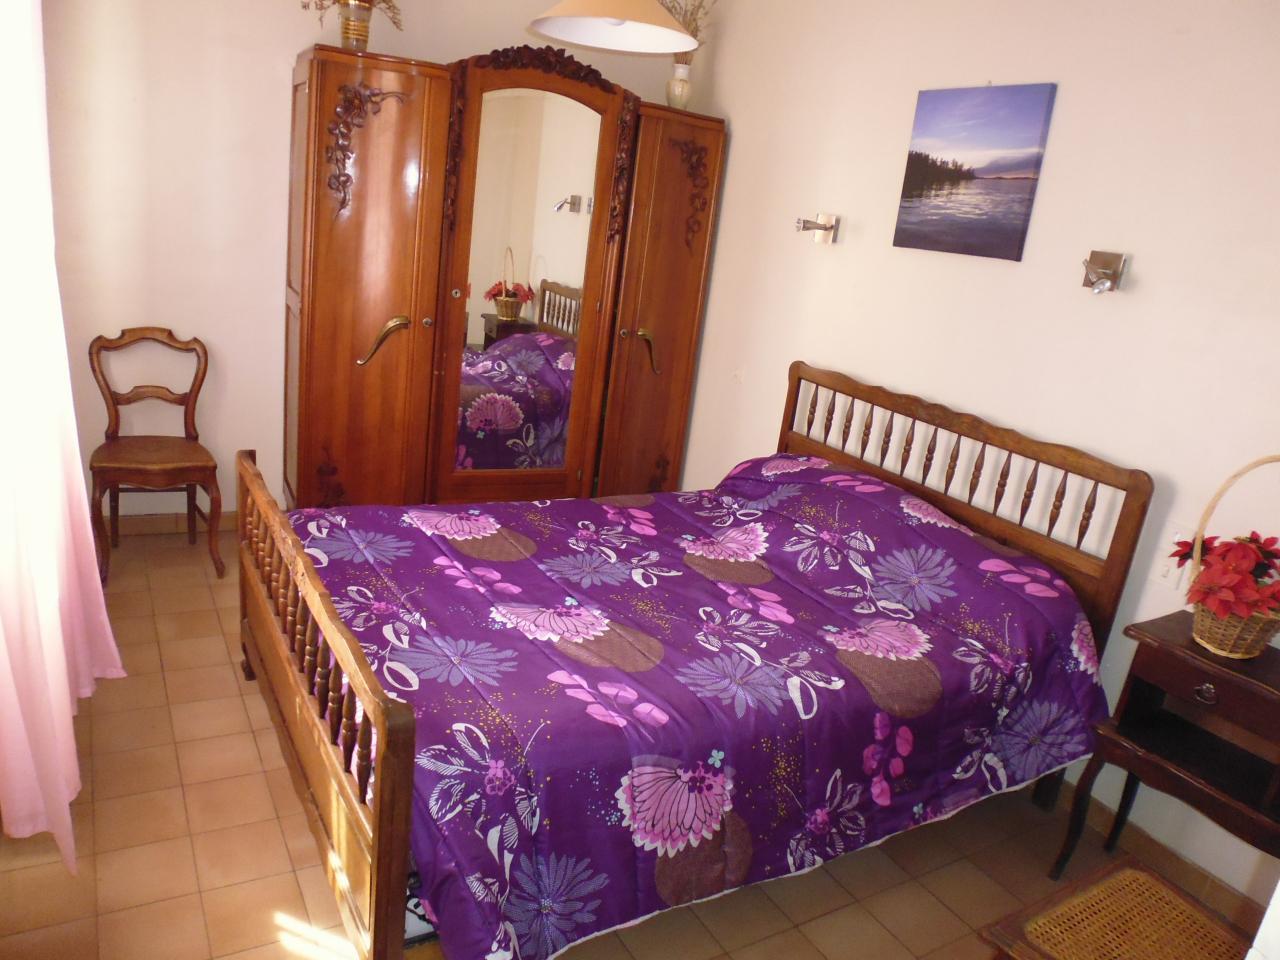 Chambre gîte les roses à Lézan gard proche d'Anduze